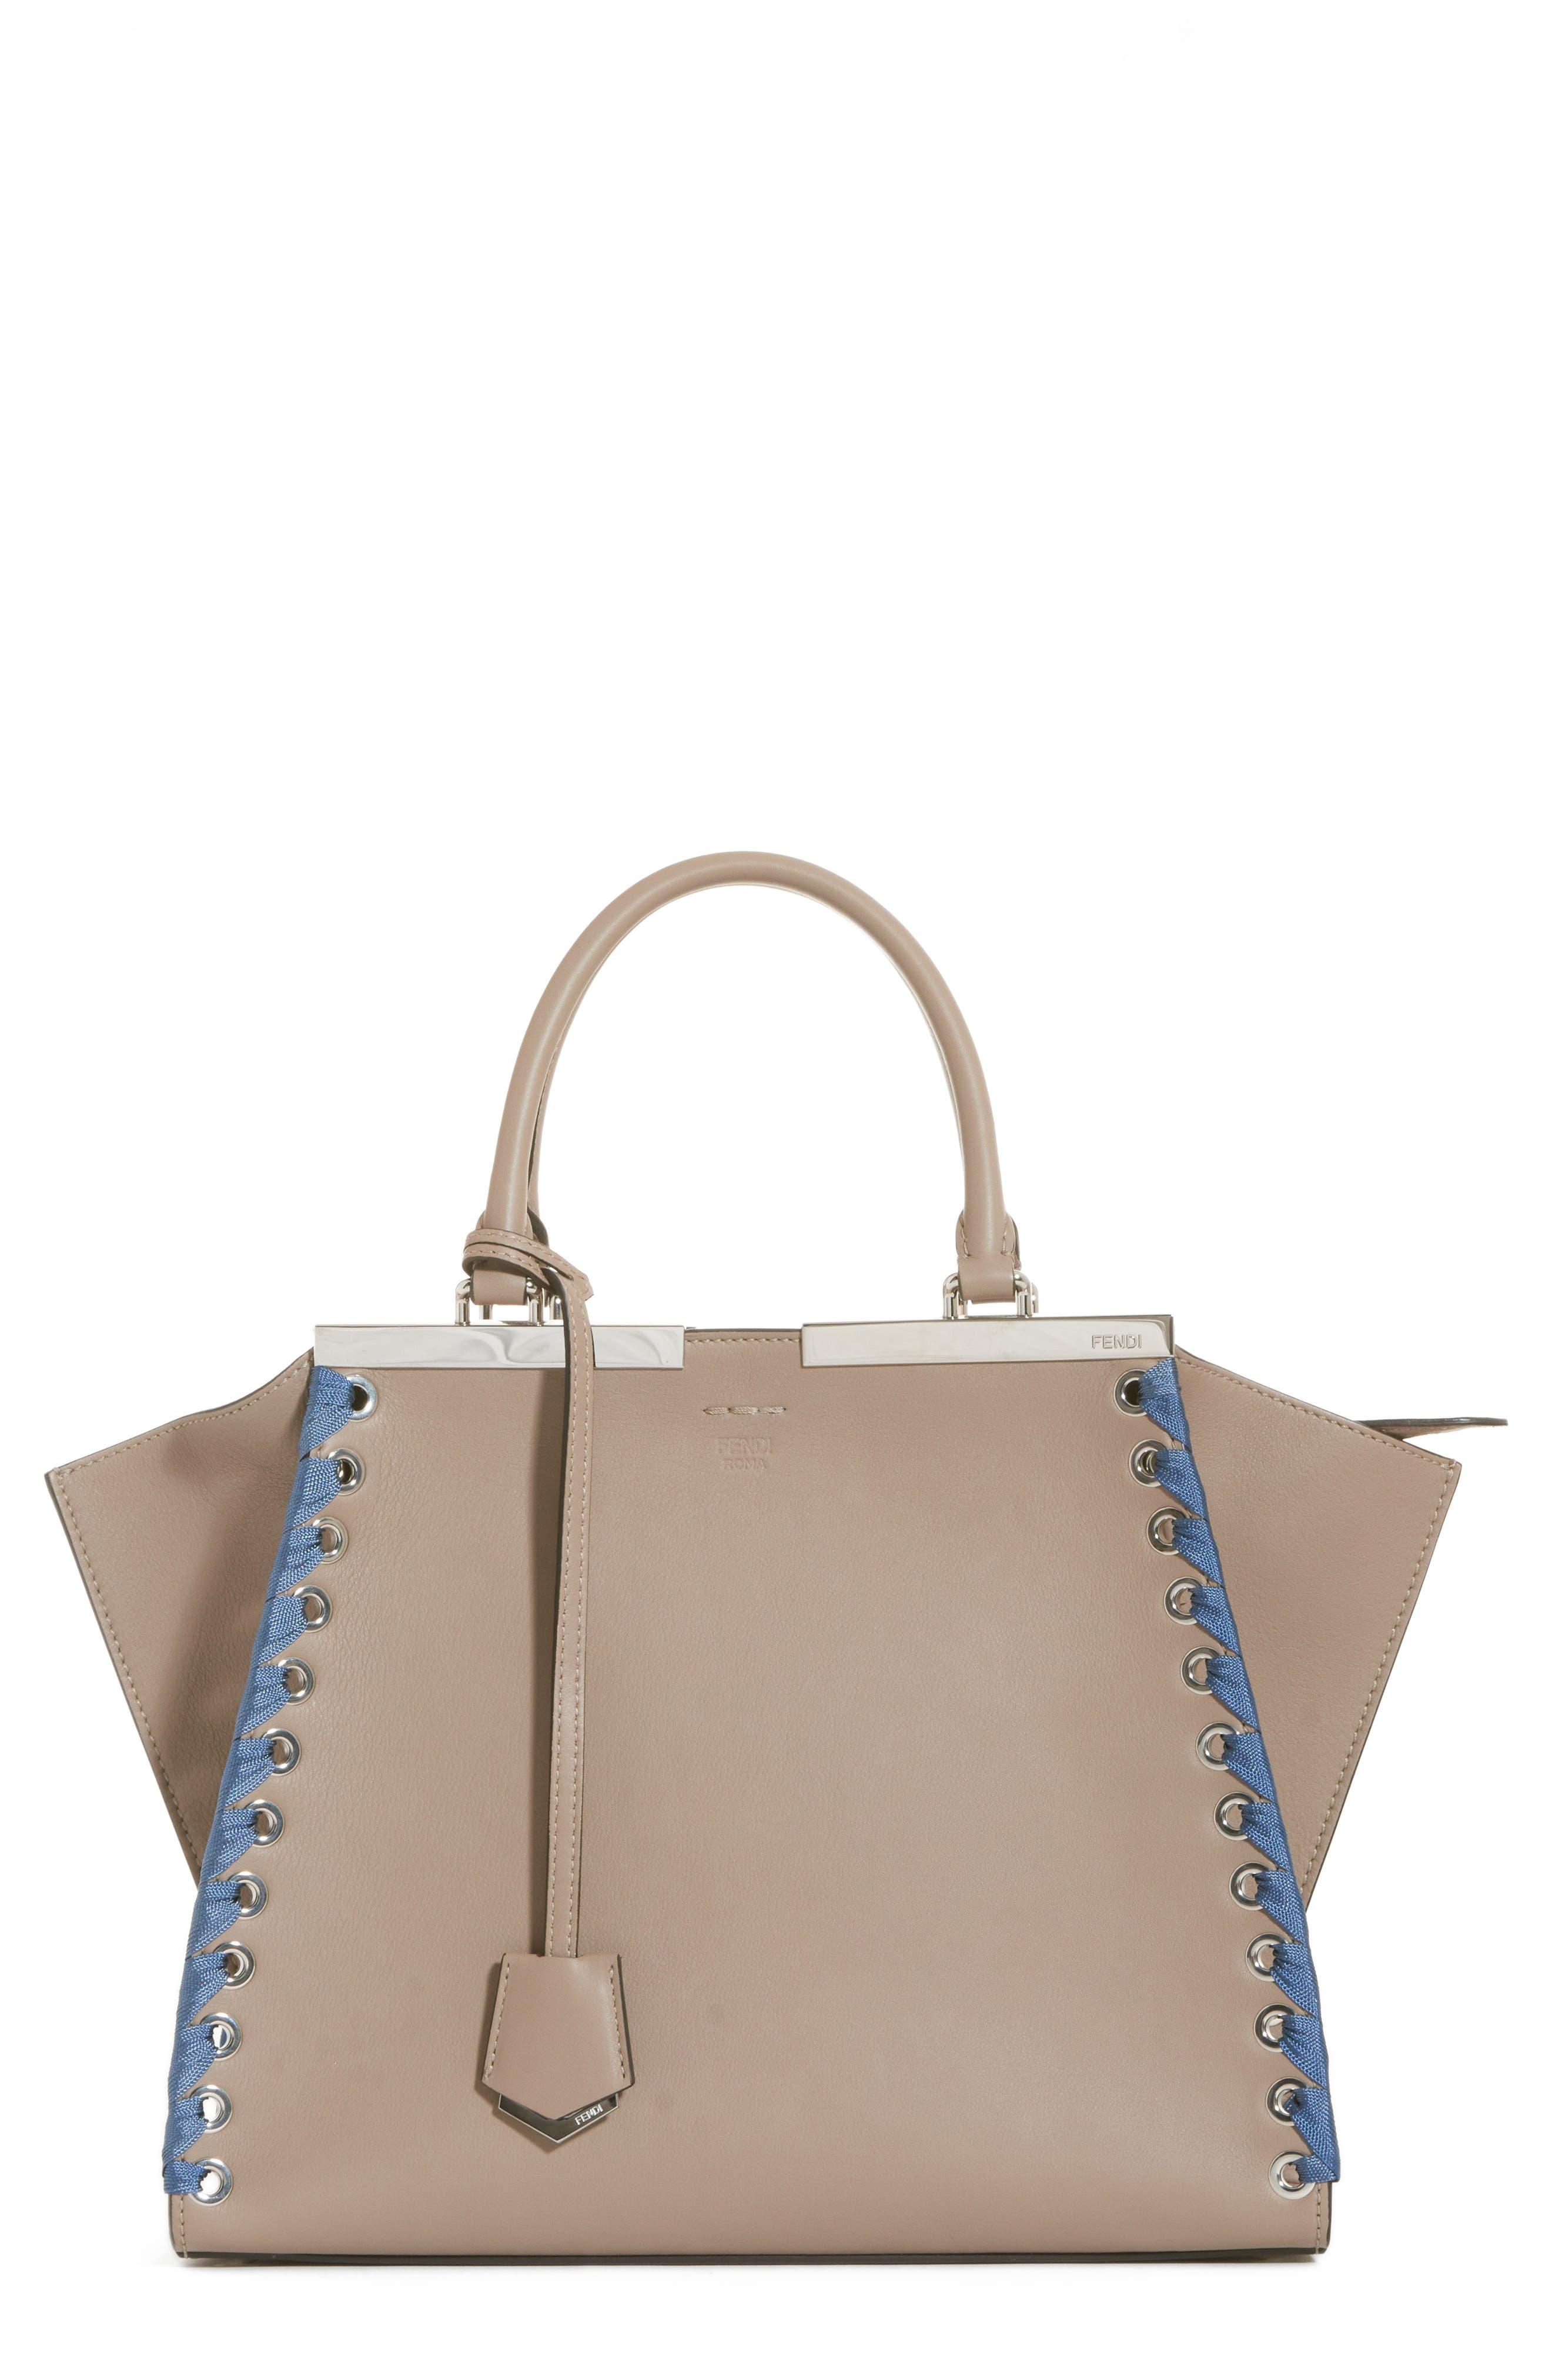 Fendi 3Jours Calfskin Leather Shopper